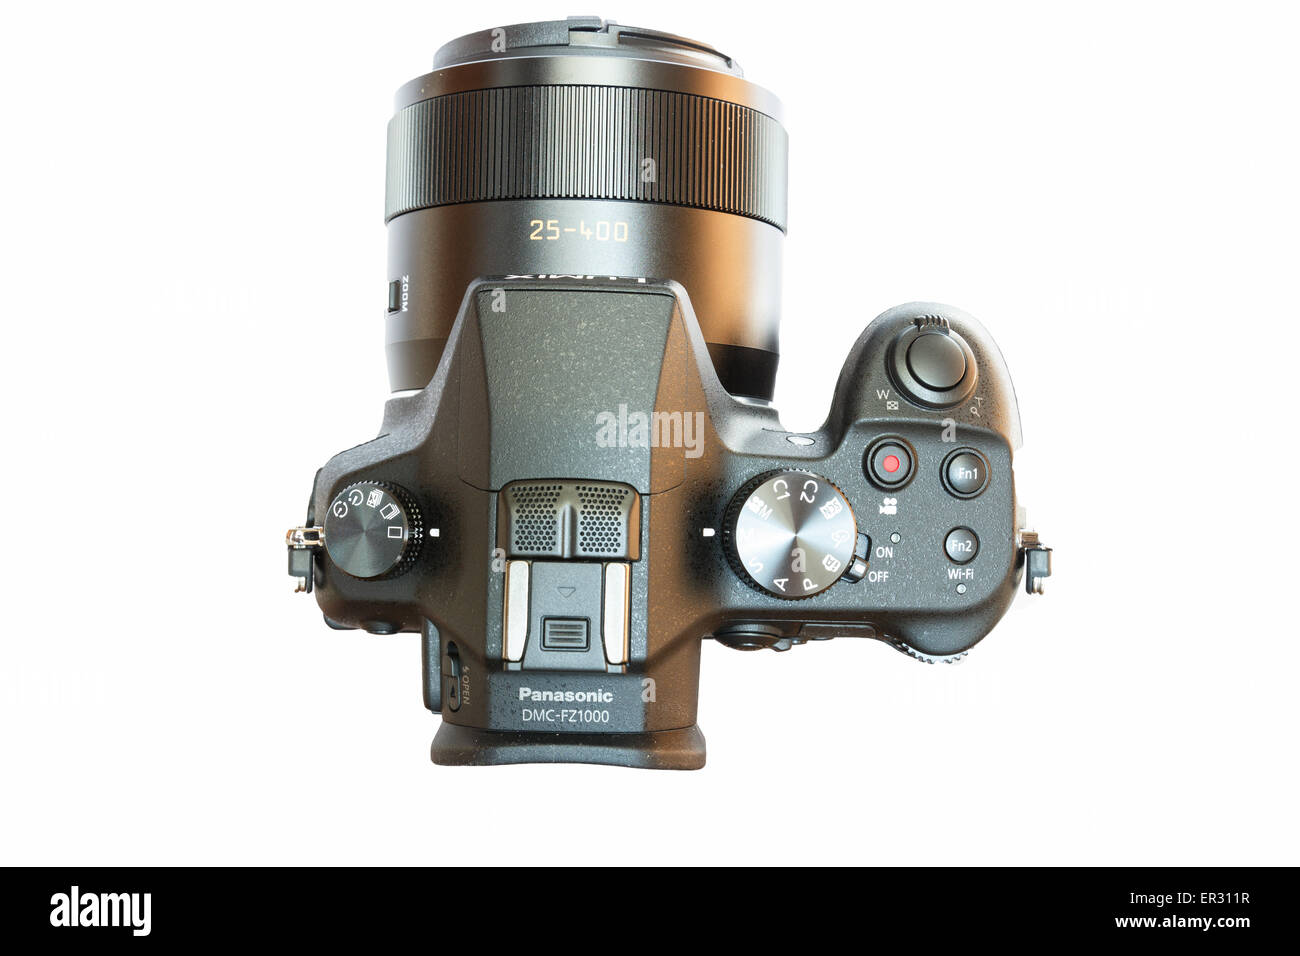 Chiang Mai, Thailand - May 14, 2015: Panasonic Lumix DMC- FZ1000 bridge digital camera isolated on white background - Stock Image